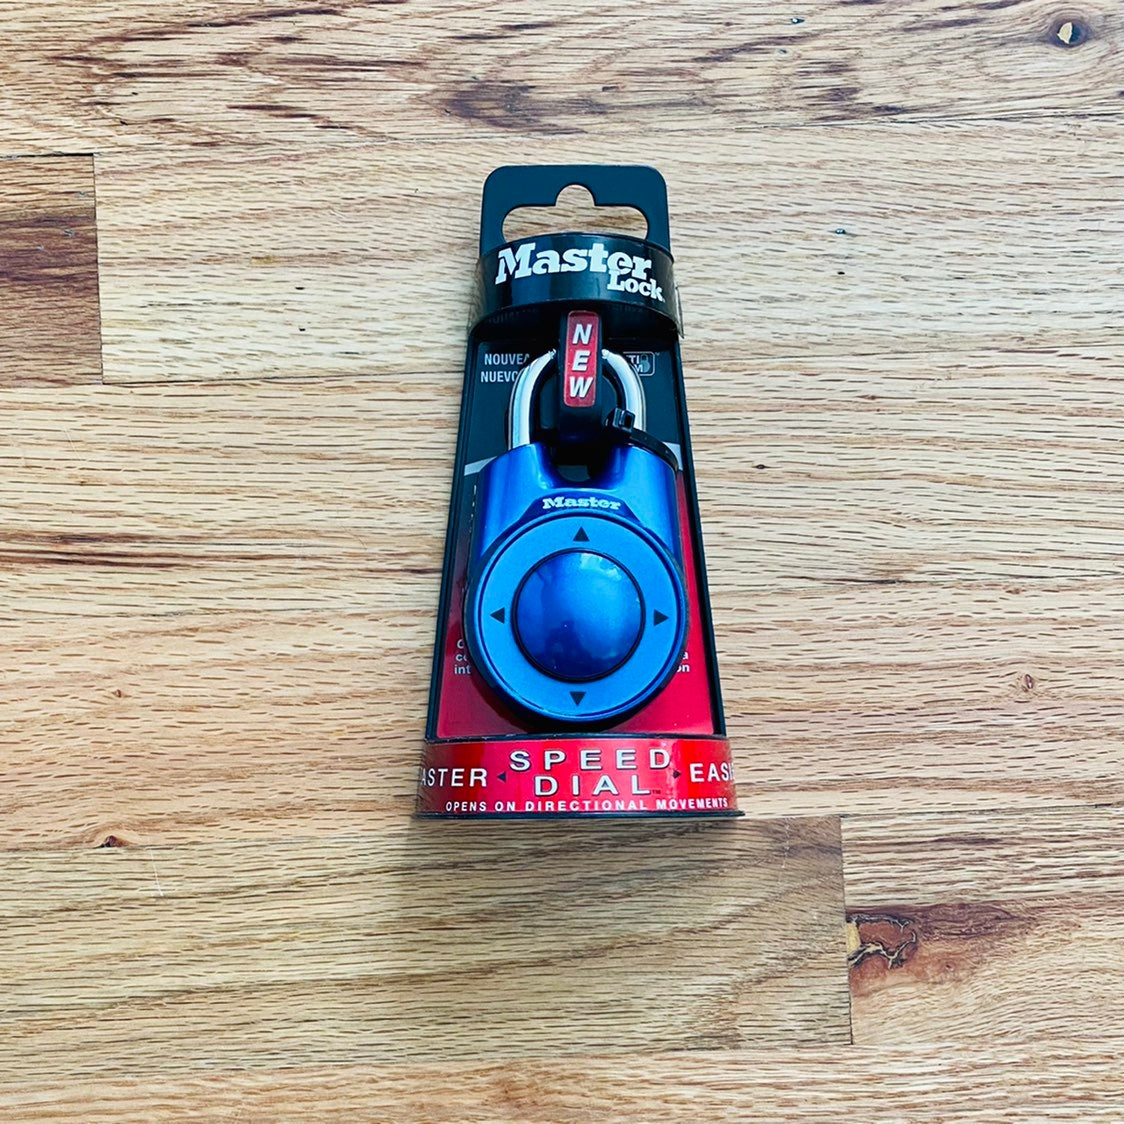 NEW Masterlock Speed Dial Lock - Blue